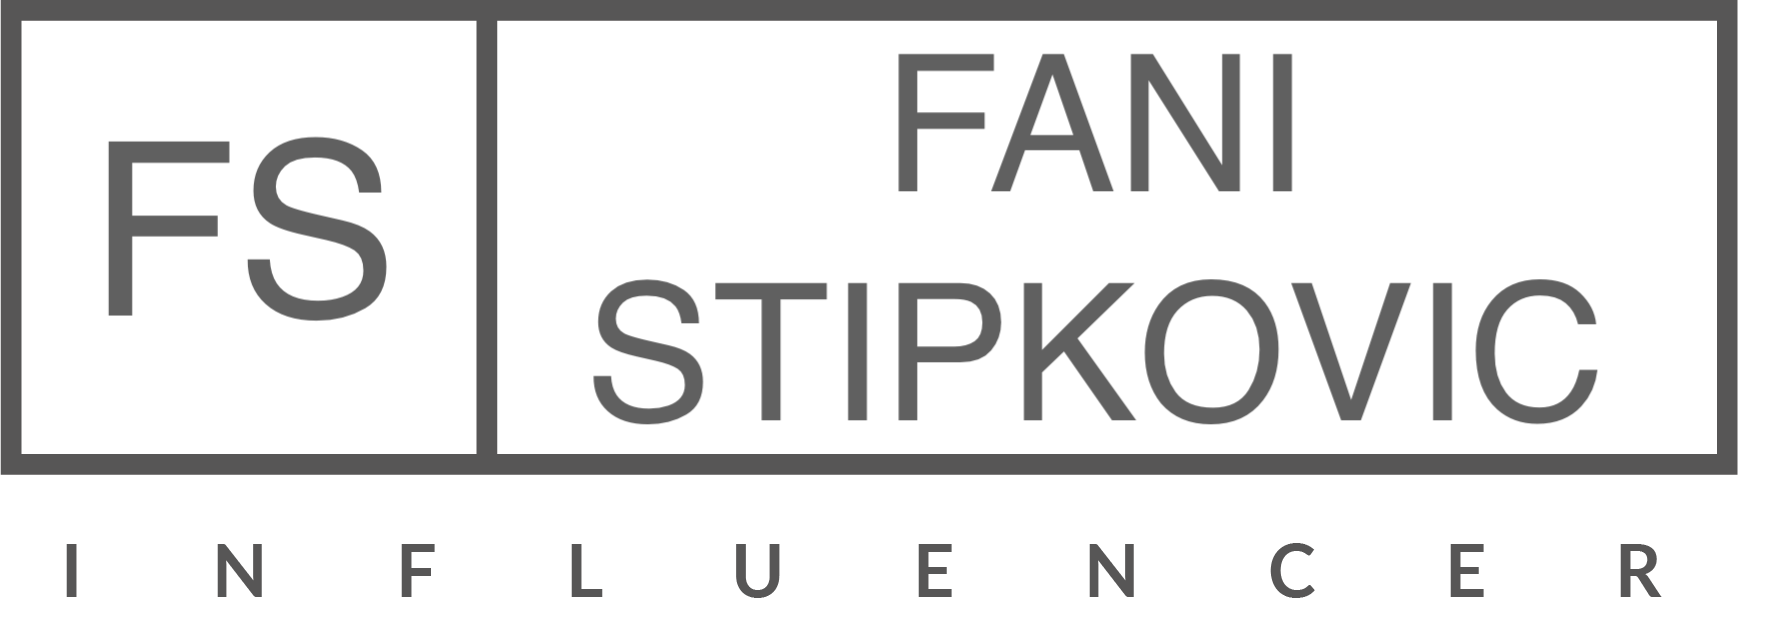 Fani Stipkovic